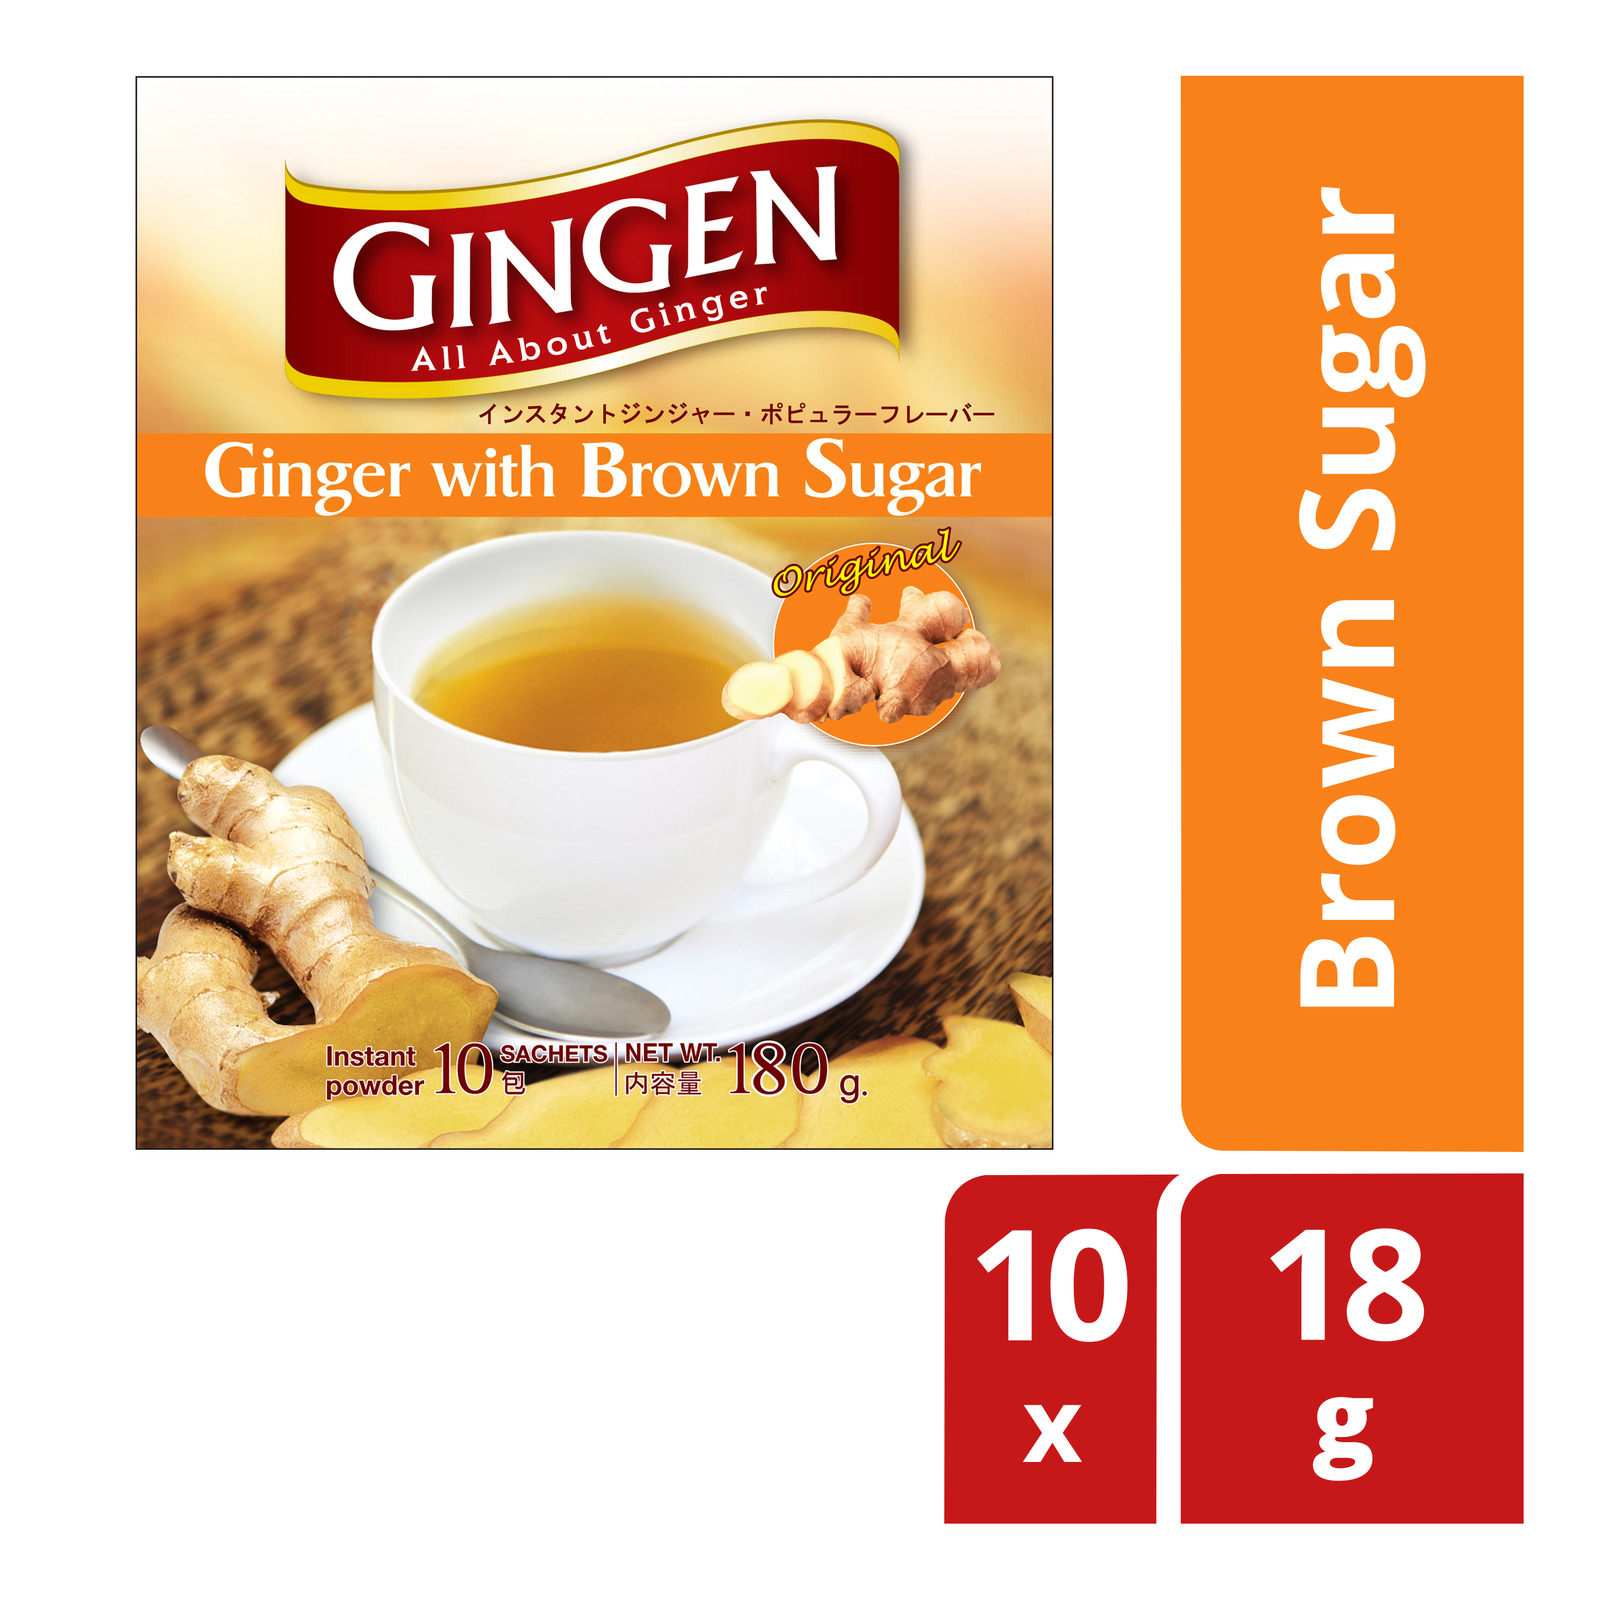 Gingen Instant Ginger Powder - Brown Sugar